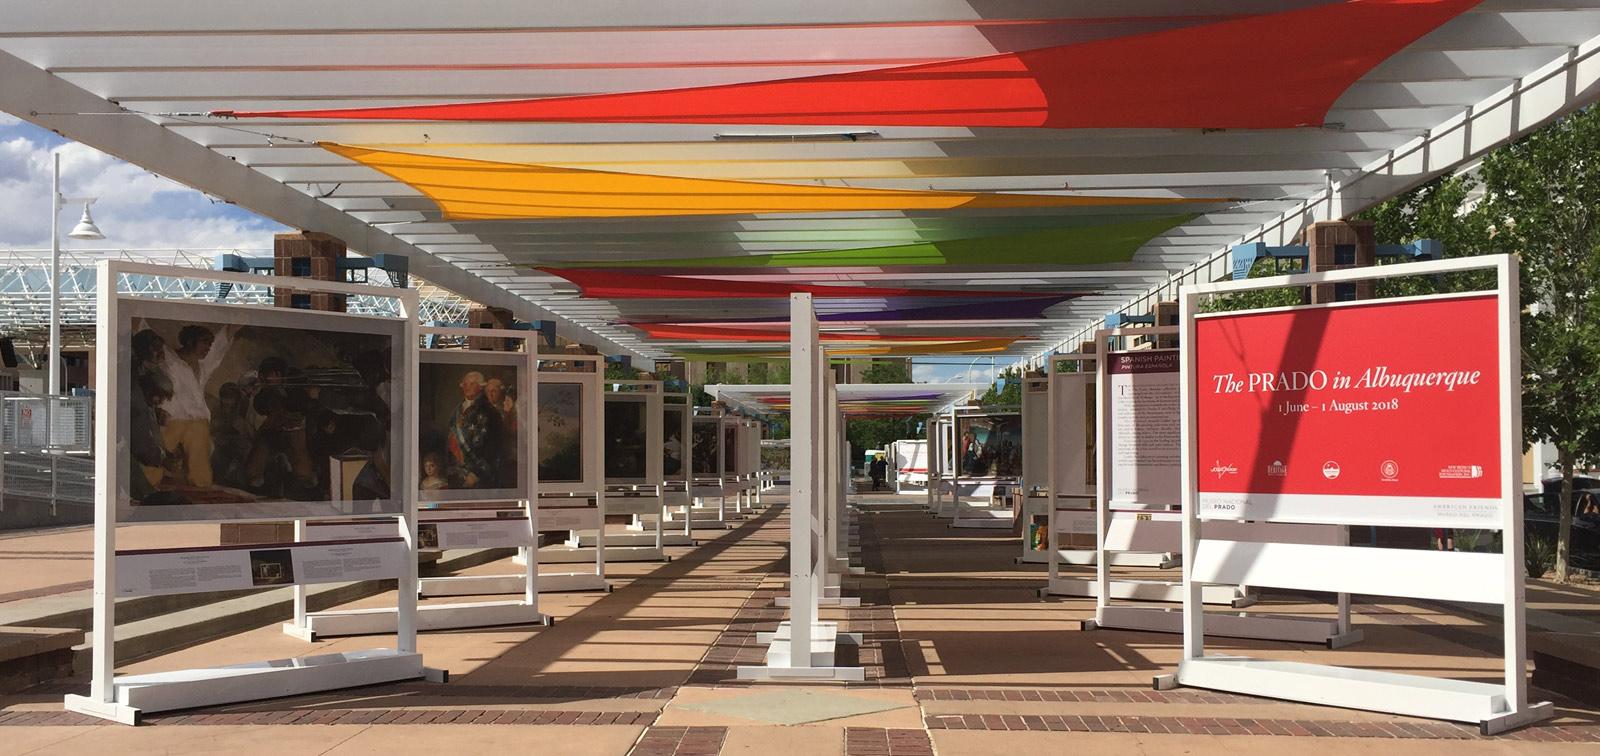 Didactic Exhibition: The Prado in Albuquerque